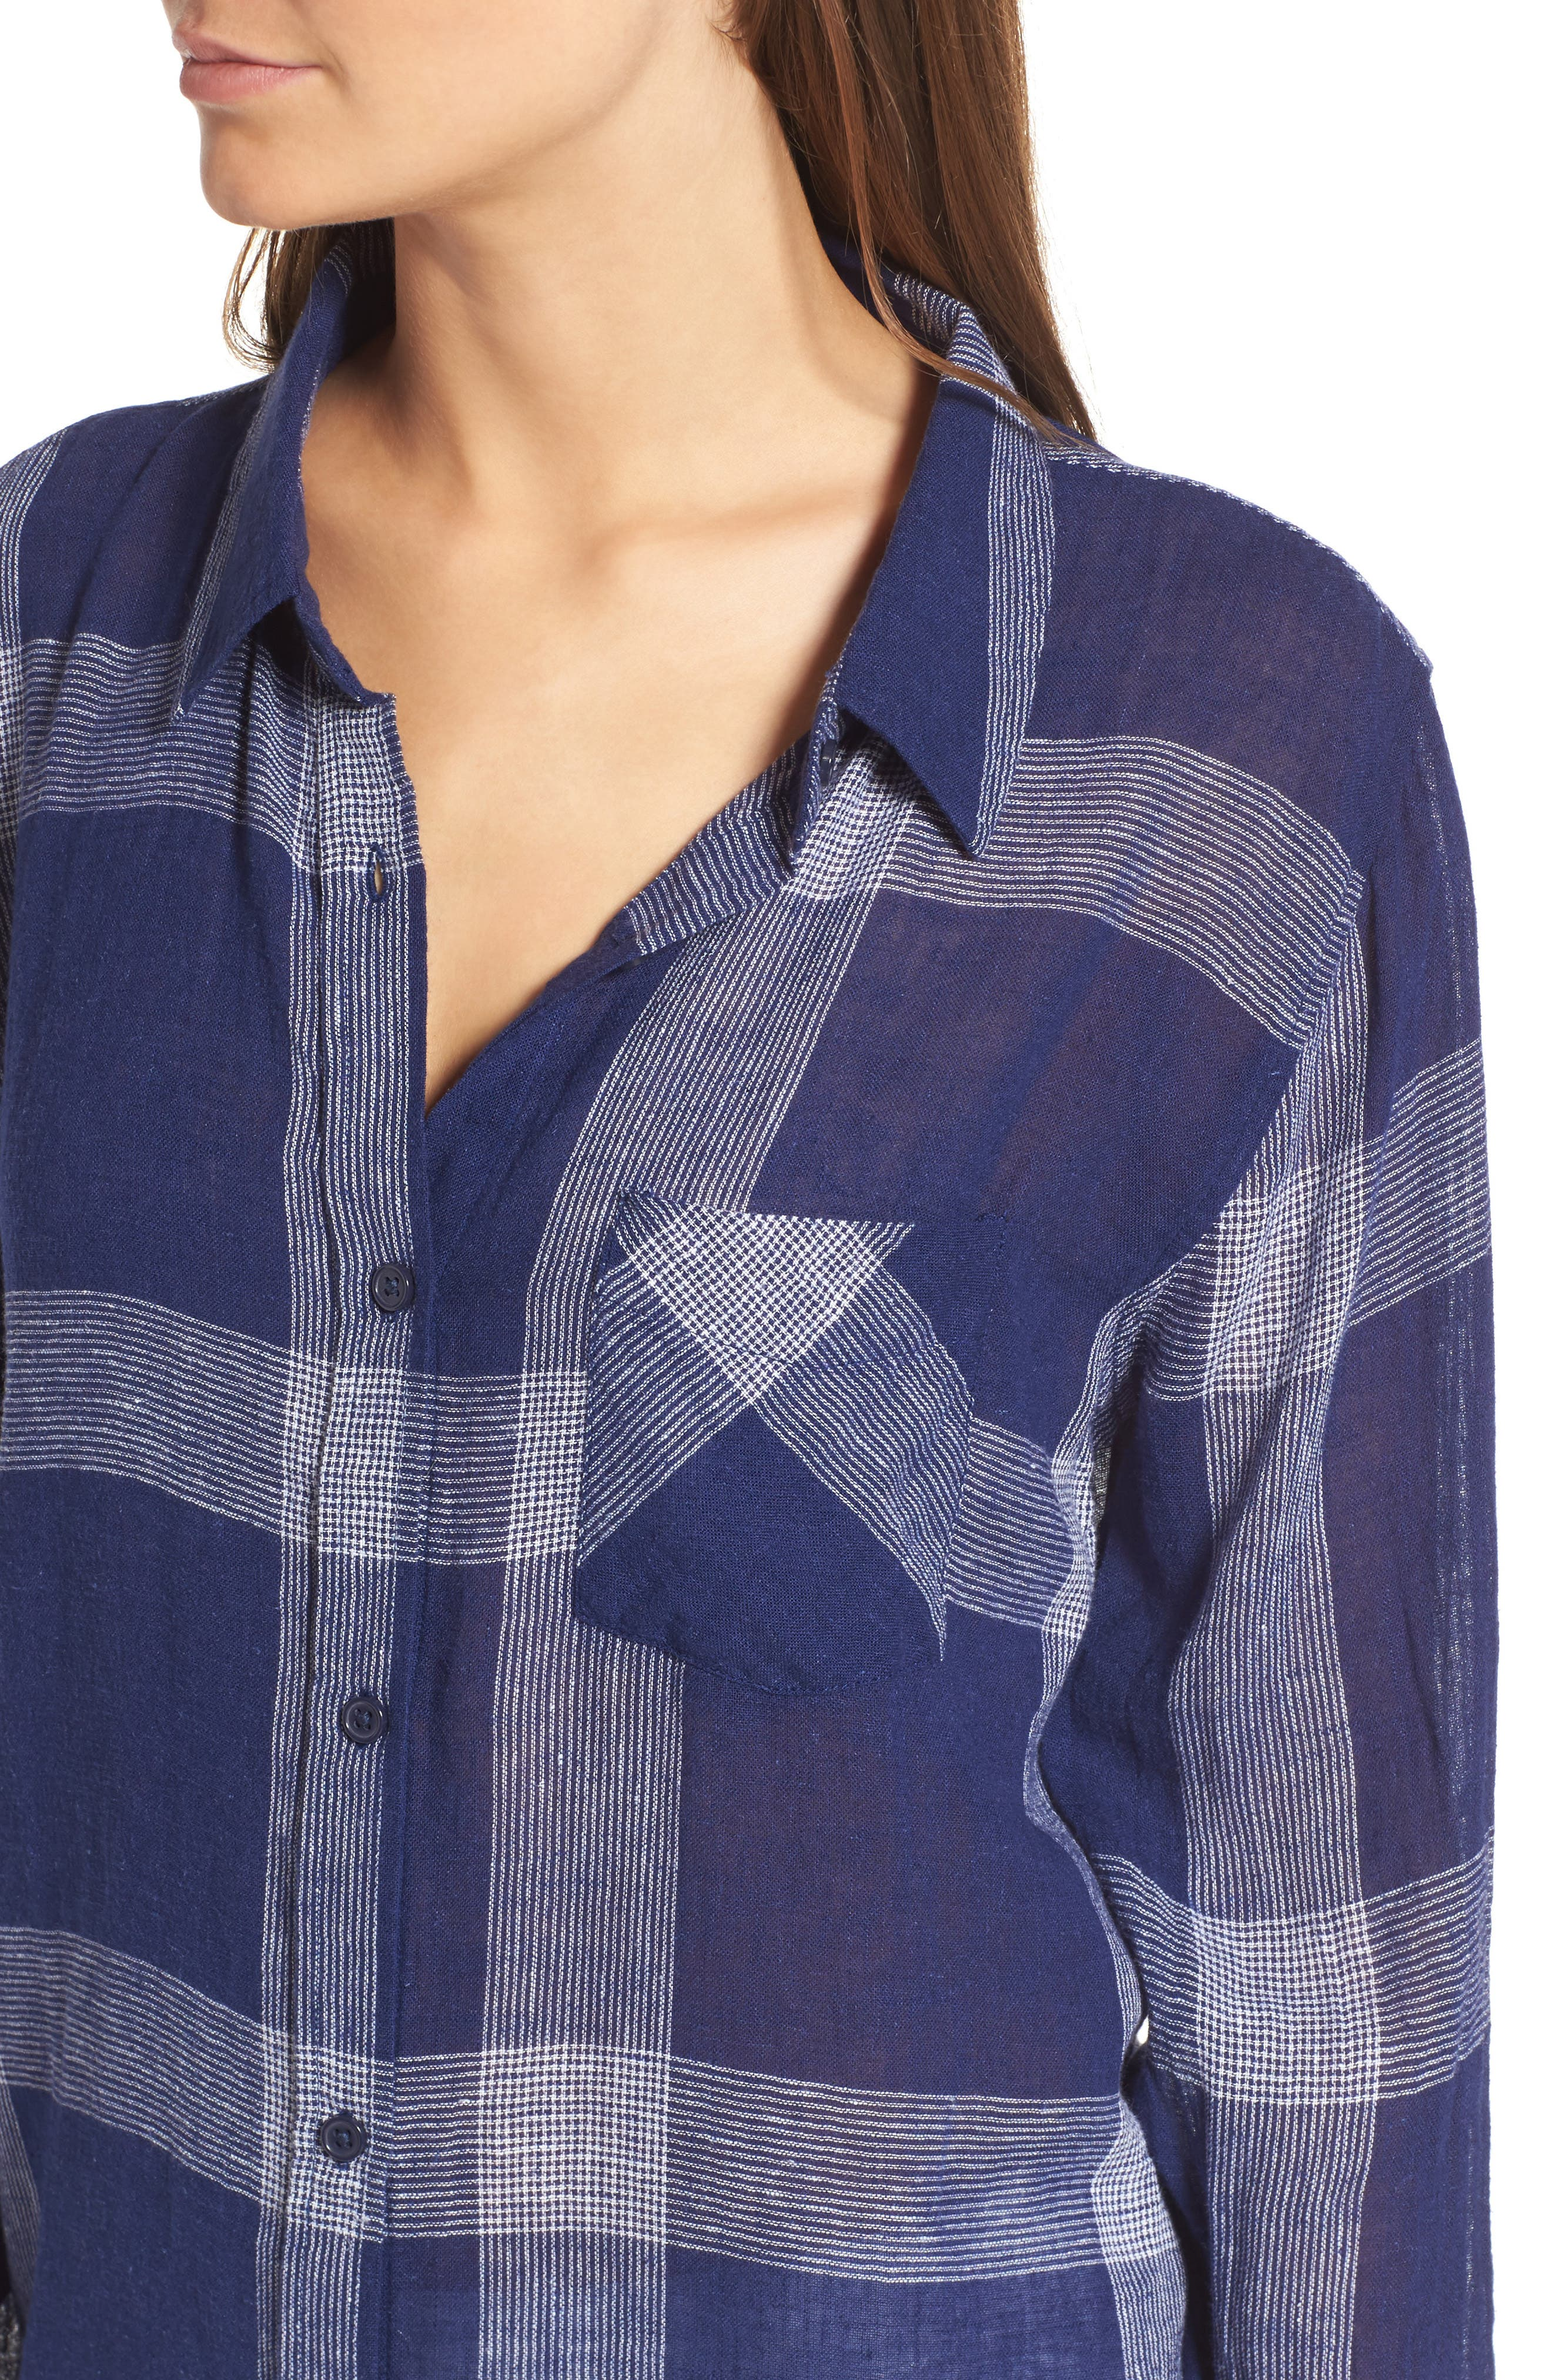 Charli Plaid Shirt,                             Alternate thumbnail 4, color,                             Patriot/ White